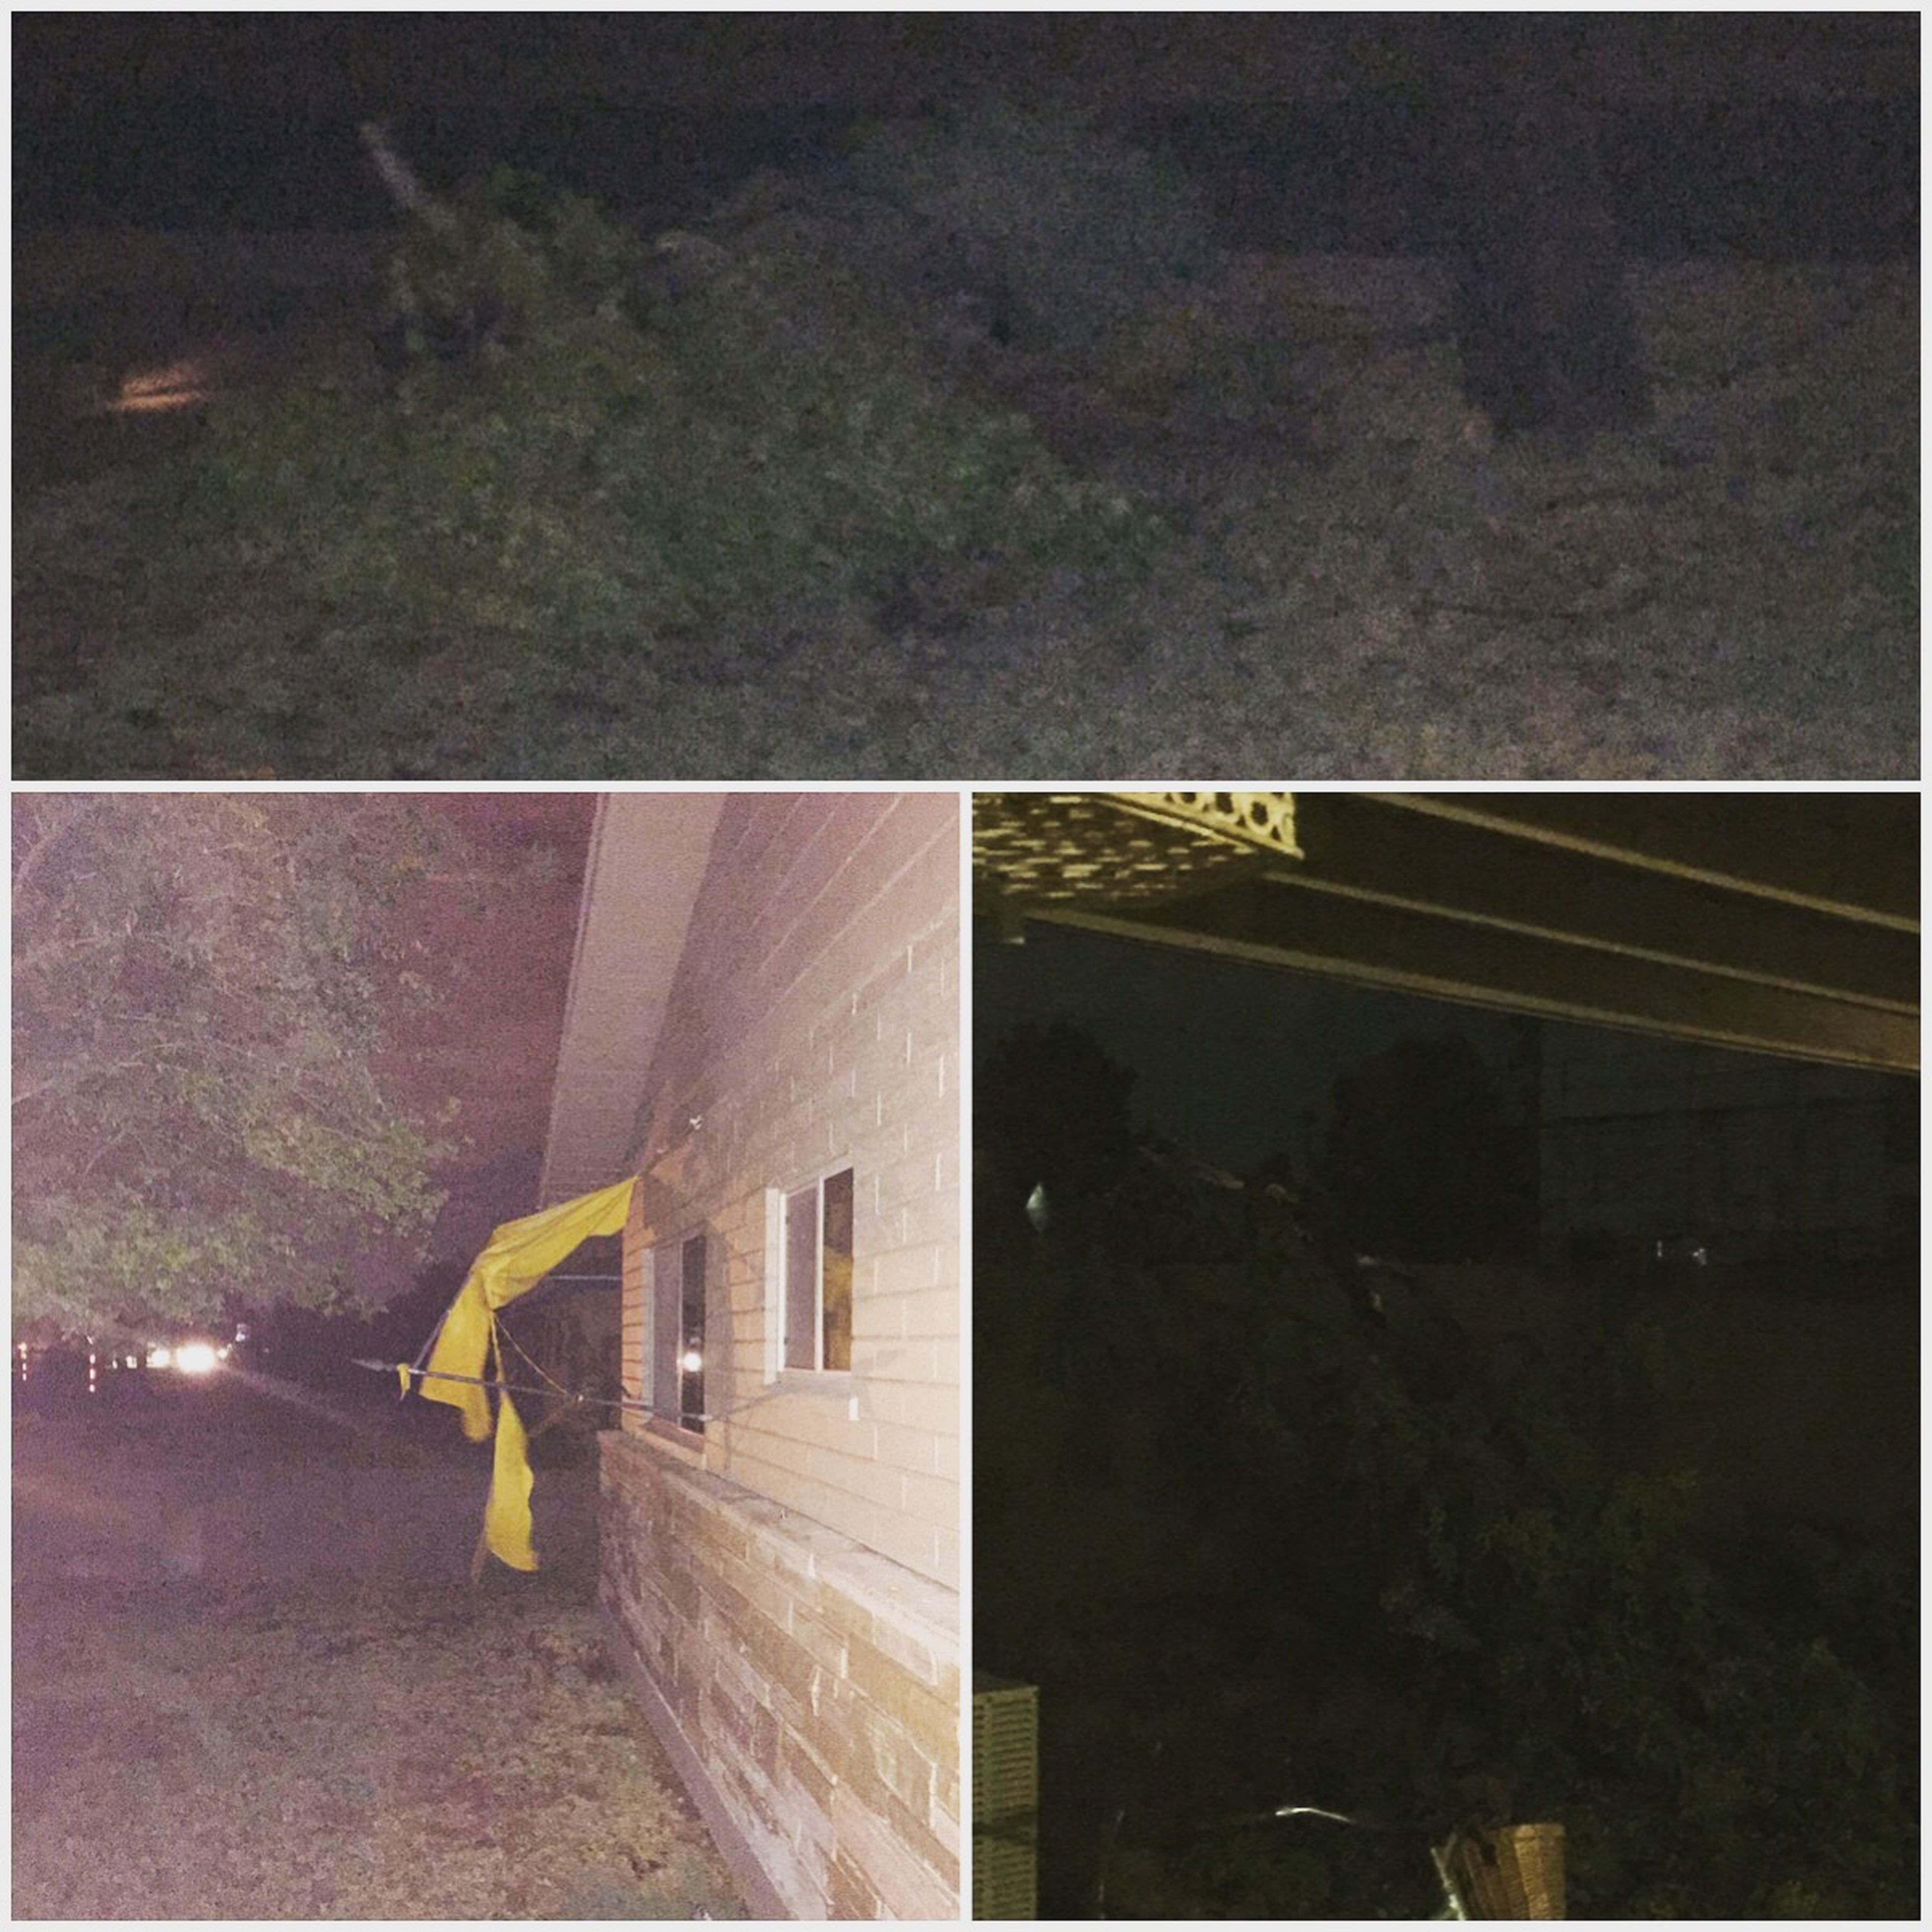 AZ Monsoon Season Tore Up My House Rain So Hard Tree Down